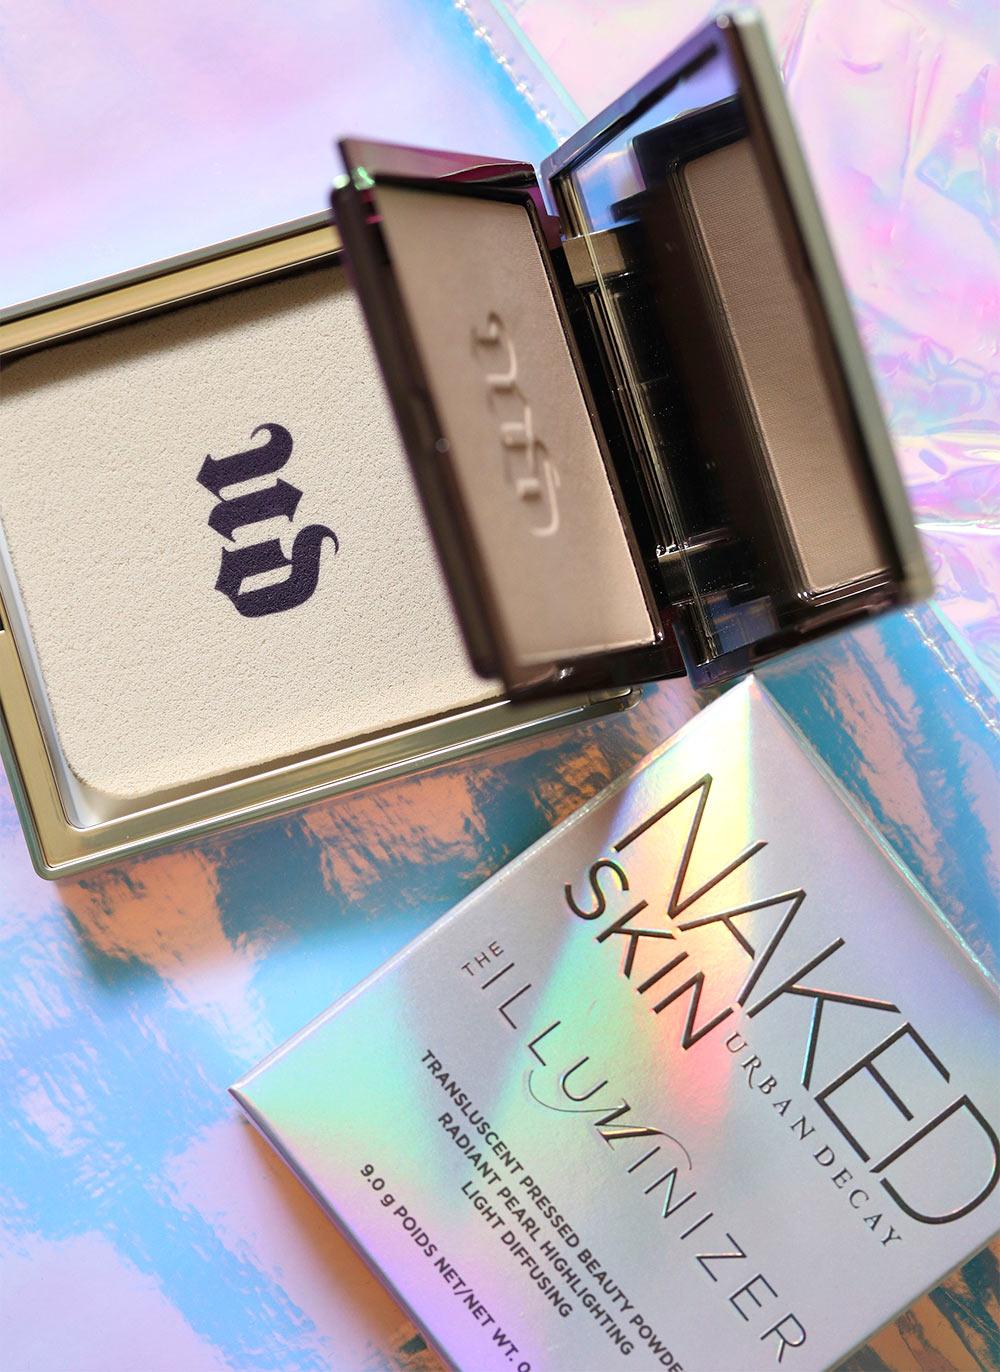 urban decay naked skin illuminizer translucent pressed beauty powder packaging